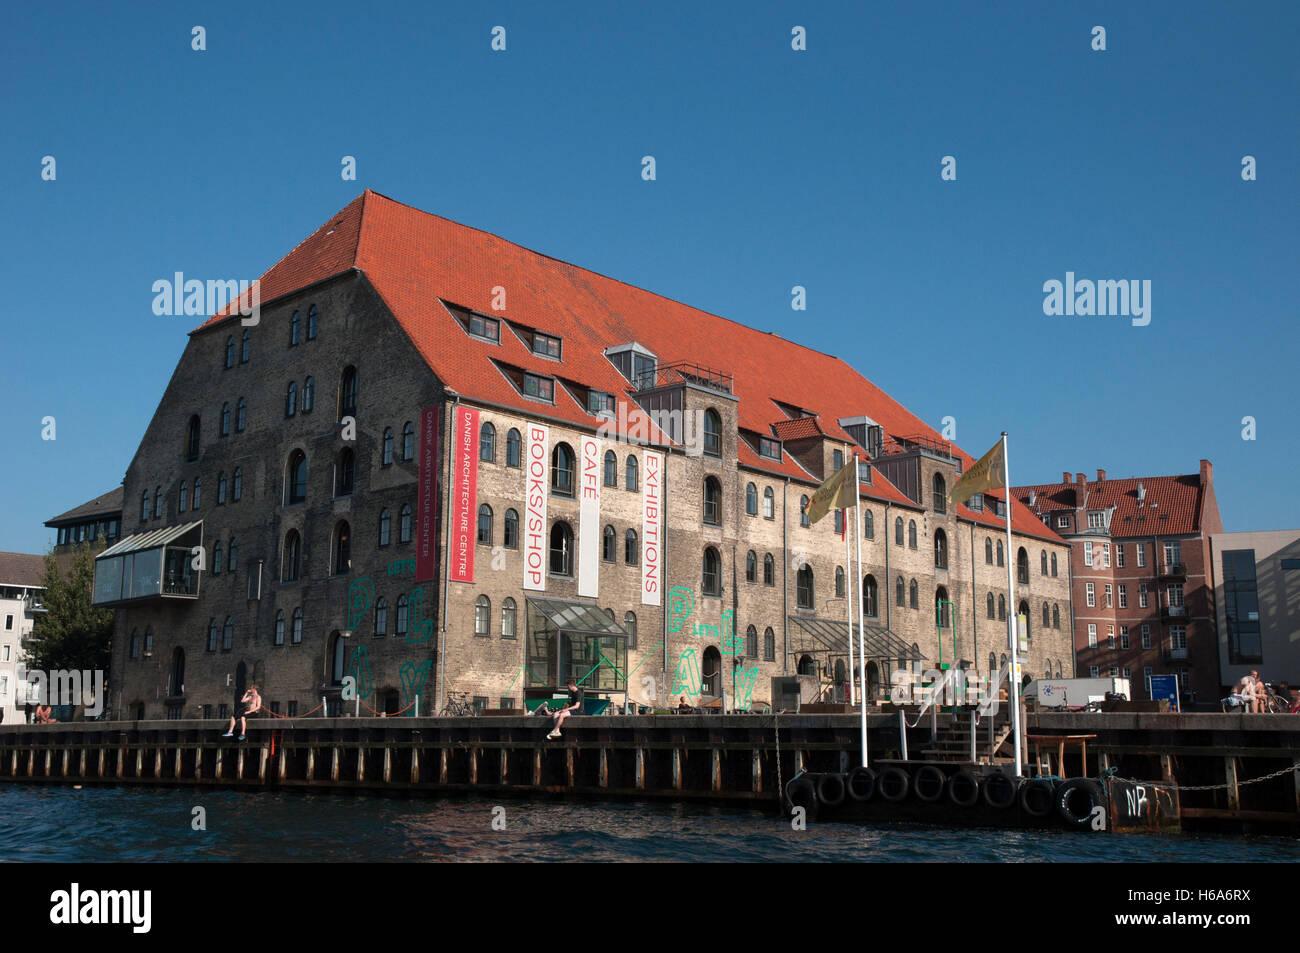 gammel dok, danish architecture center copenhagen - Stock Image